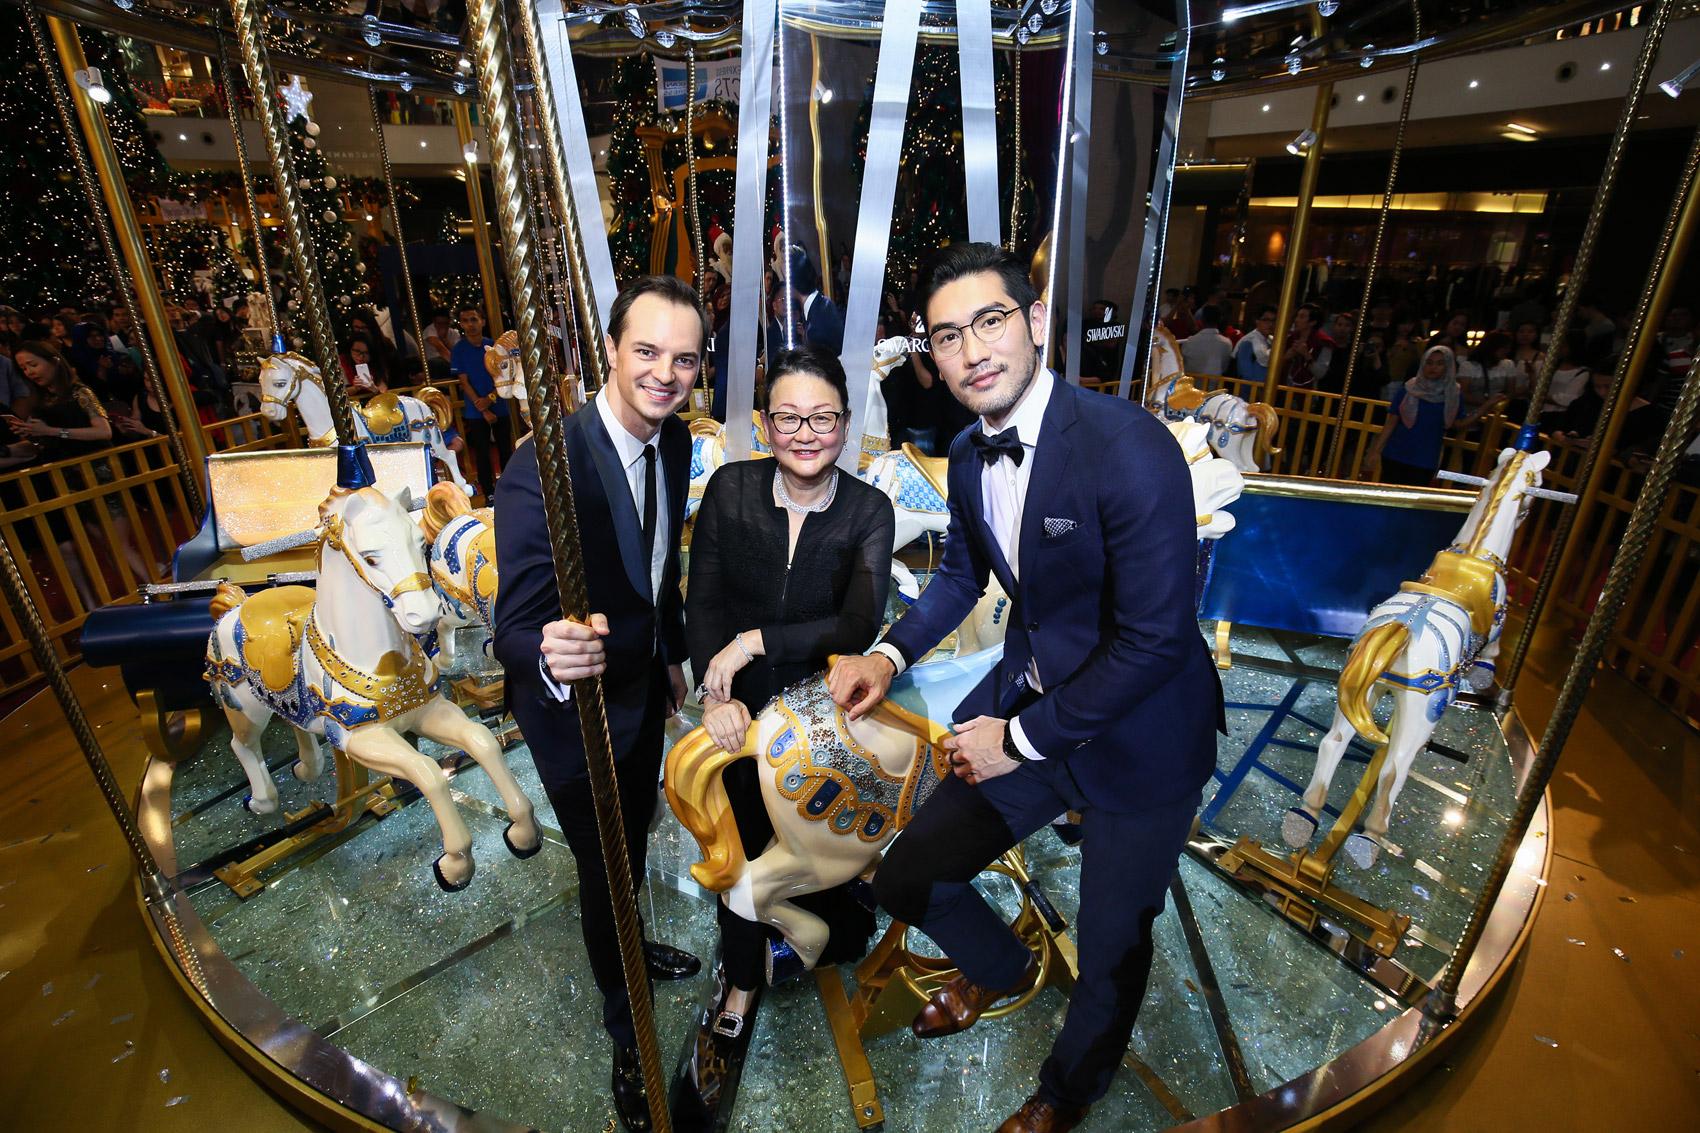 Swarovski Introduces The World's First Crystallised Merry-Go-Round